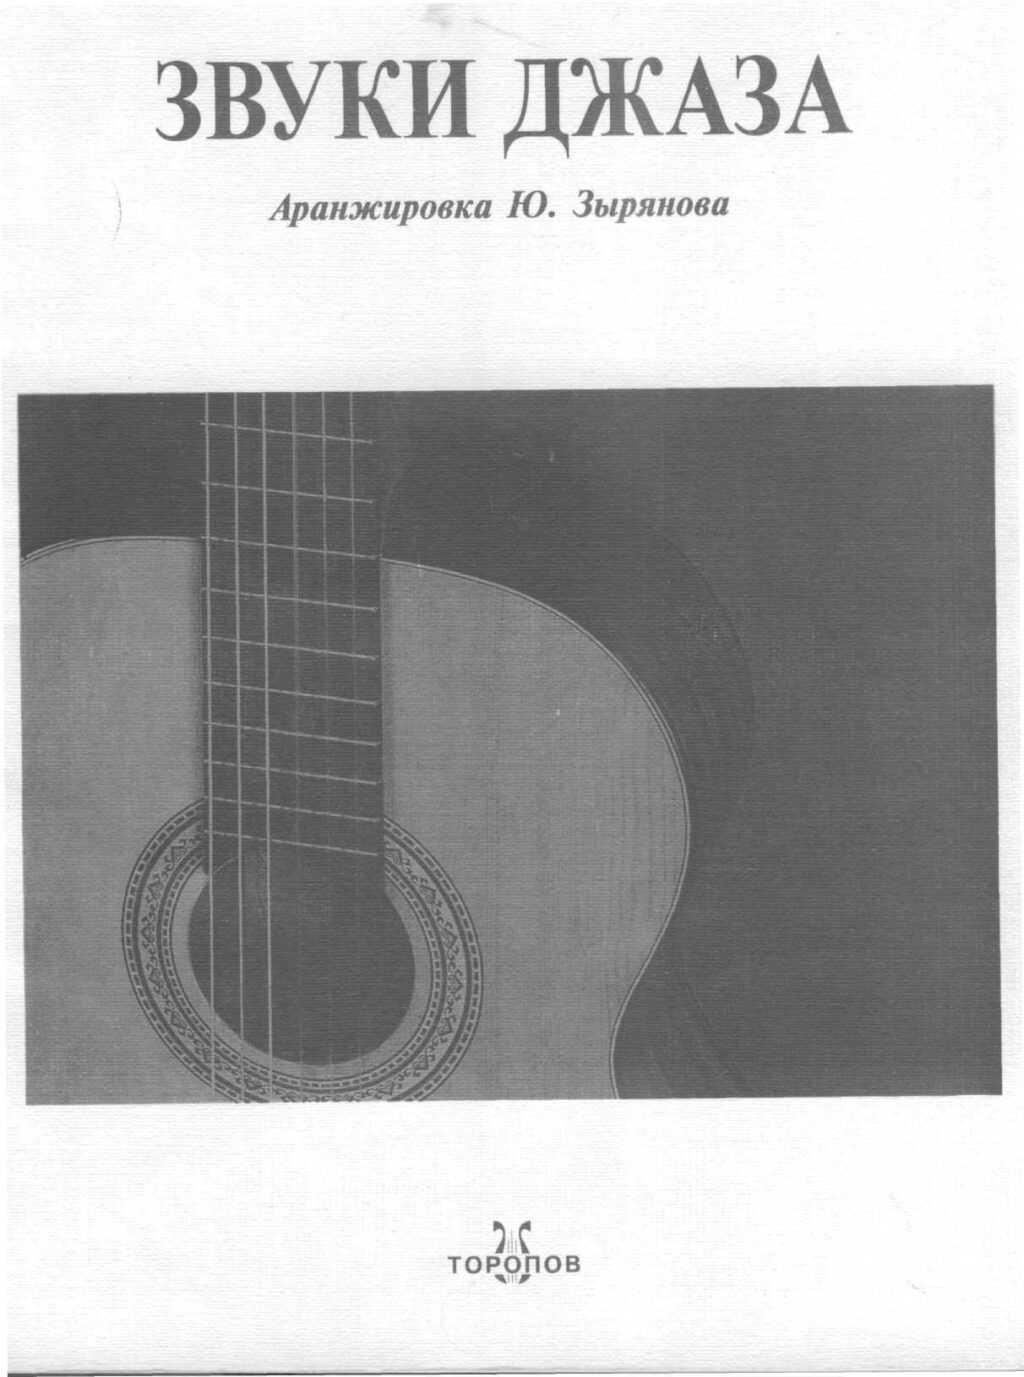 Звуки джаза. Зырянов Ю.